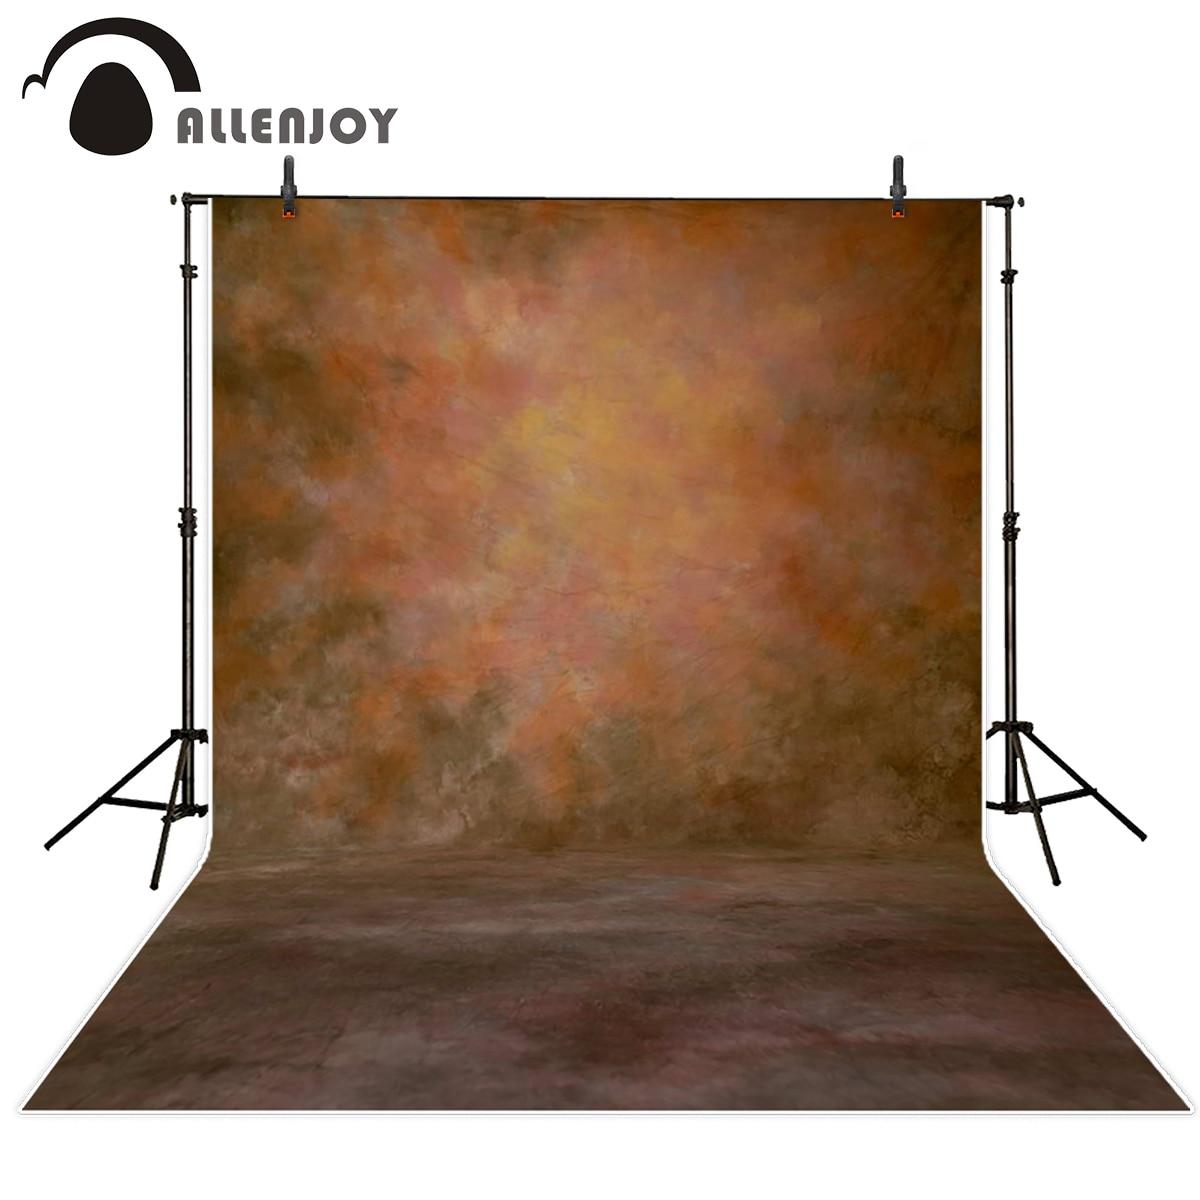 Allenjoy photo background brown solid color pure color dark photography backgrounds send folded 200*300cm excluding bracket